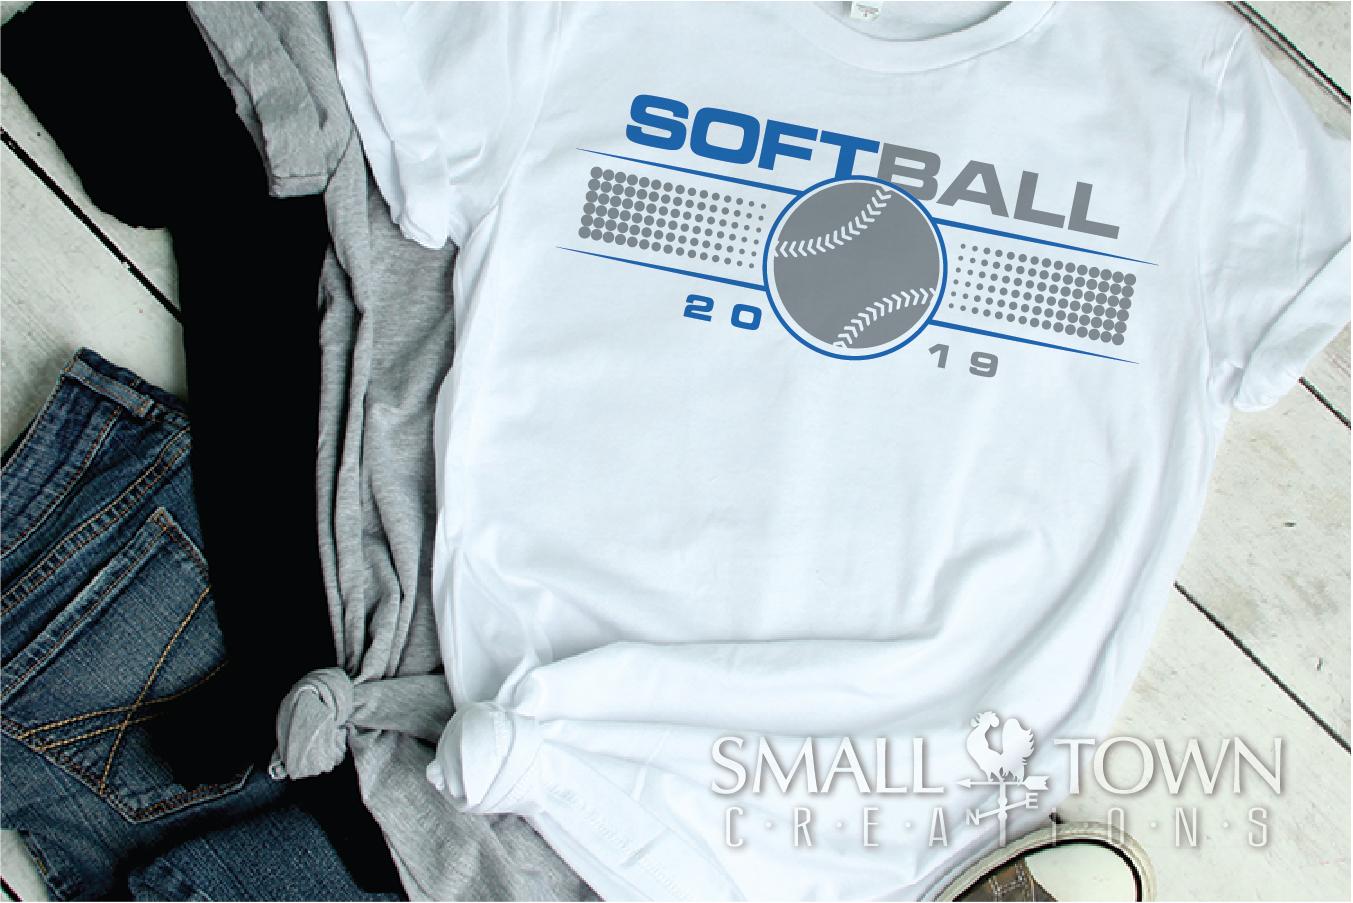 Softball, Ball sport, Sports, Team logo, PRINT, CUT & DESIGN example image 5